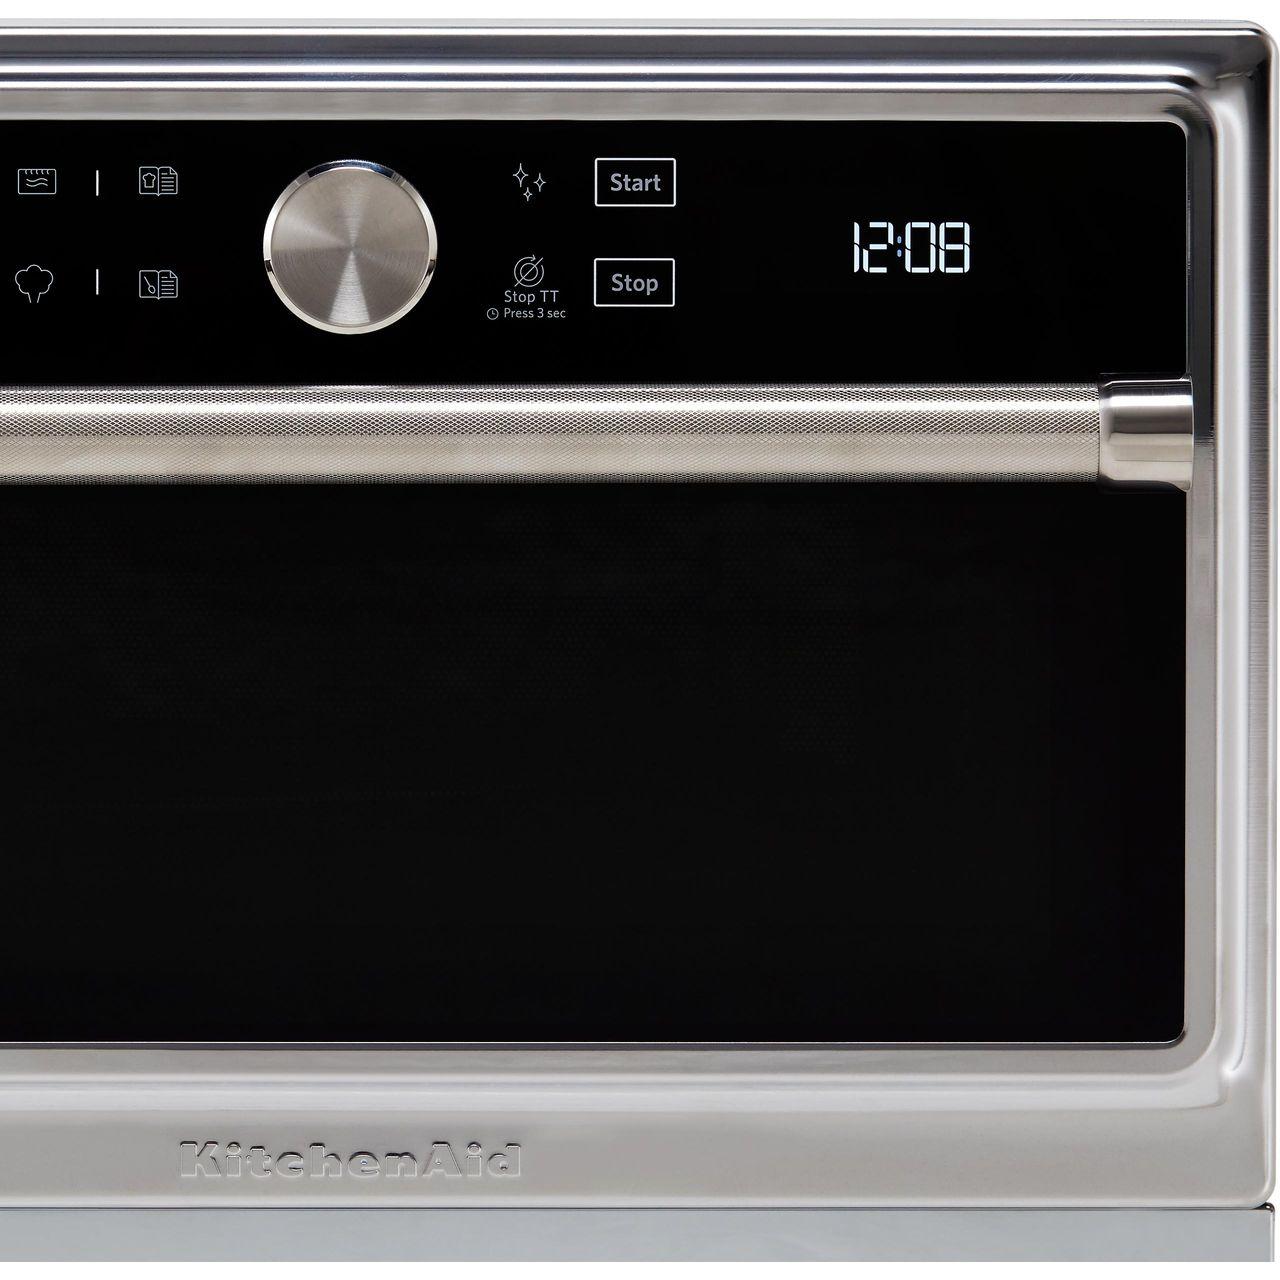 Kmqfx33910 Ss Kitchenaid Freestanding Microwave Ao Com